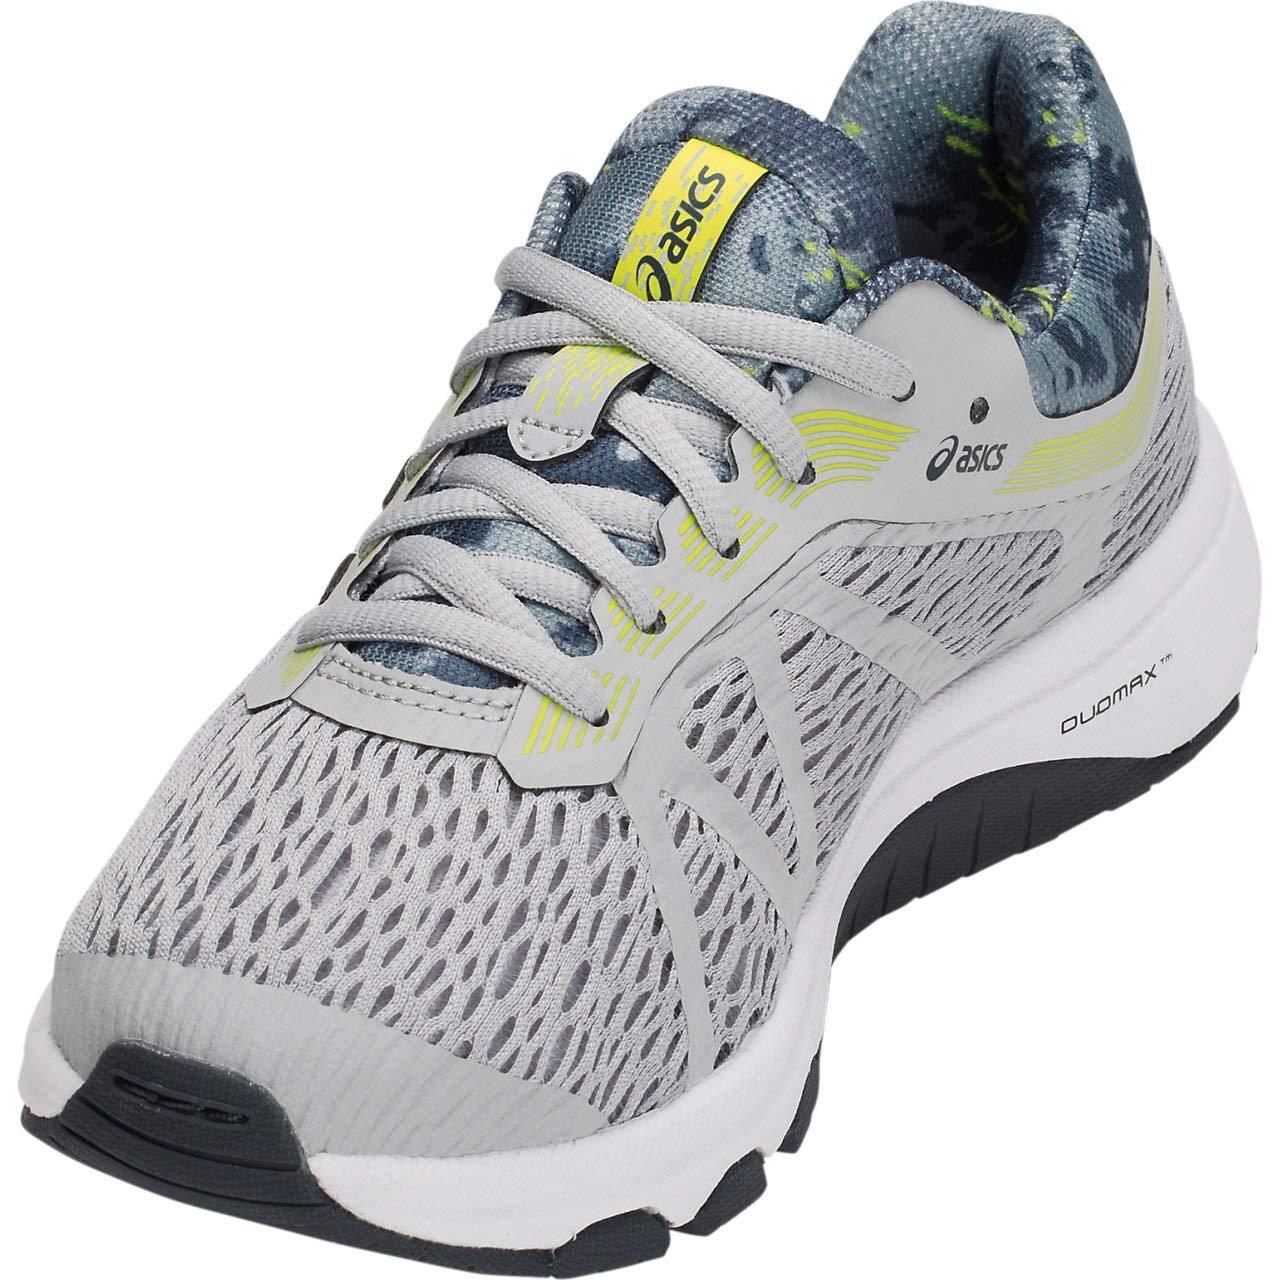 punto final Refrescante patio de recreo  Buy ASICS Unisex Kid's MID Grey Running Shoes-4 UK (37.5 EU) (5 US)  (1014A038) at Amazon.in